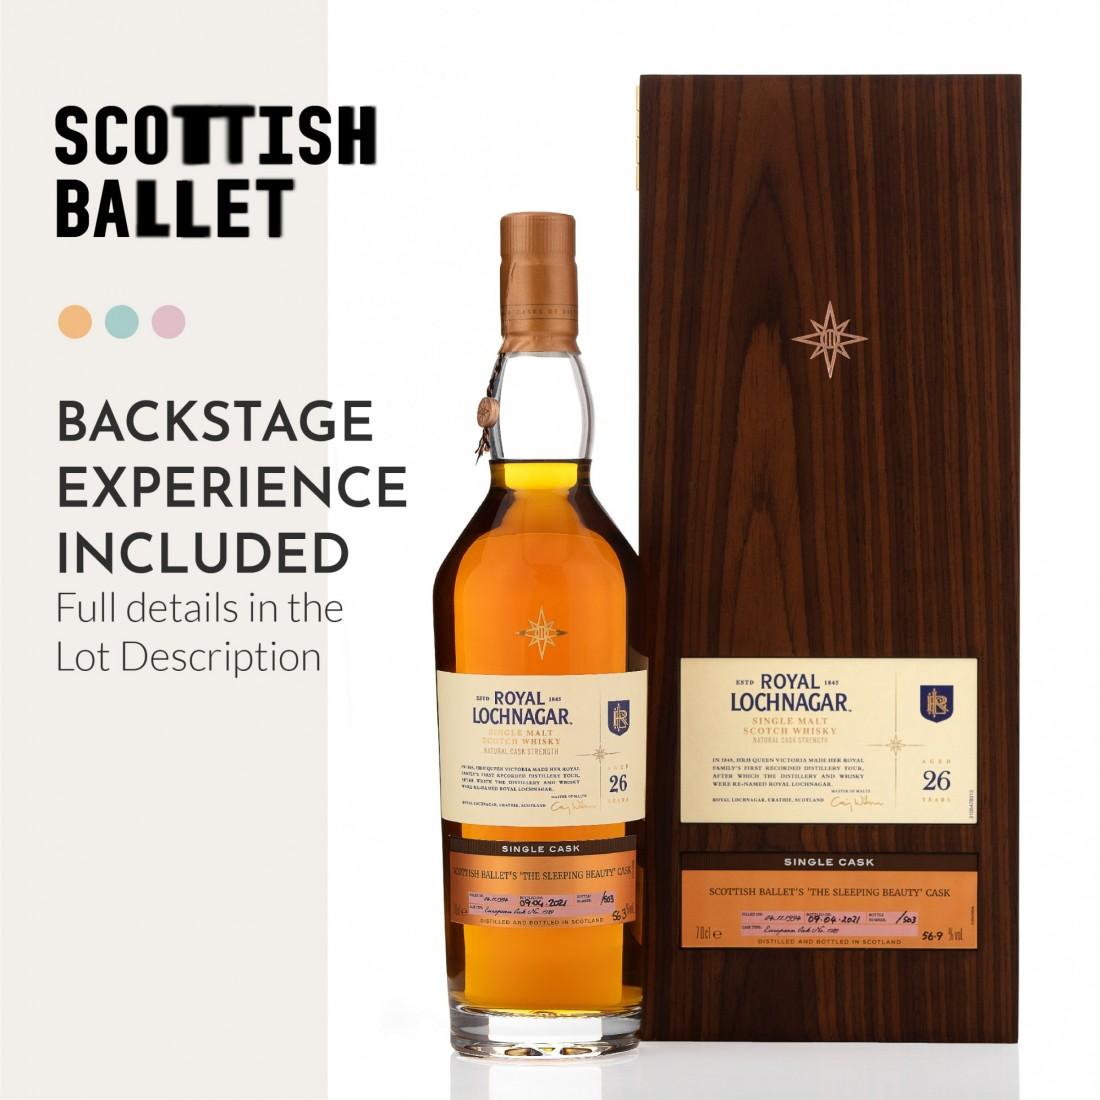 Royal Lochnagar 1994 Casks of Distinction 26 Year Old #1289 / Bottle #008